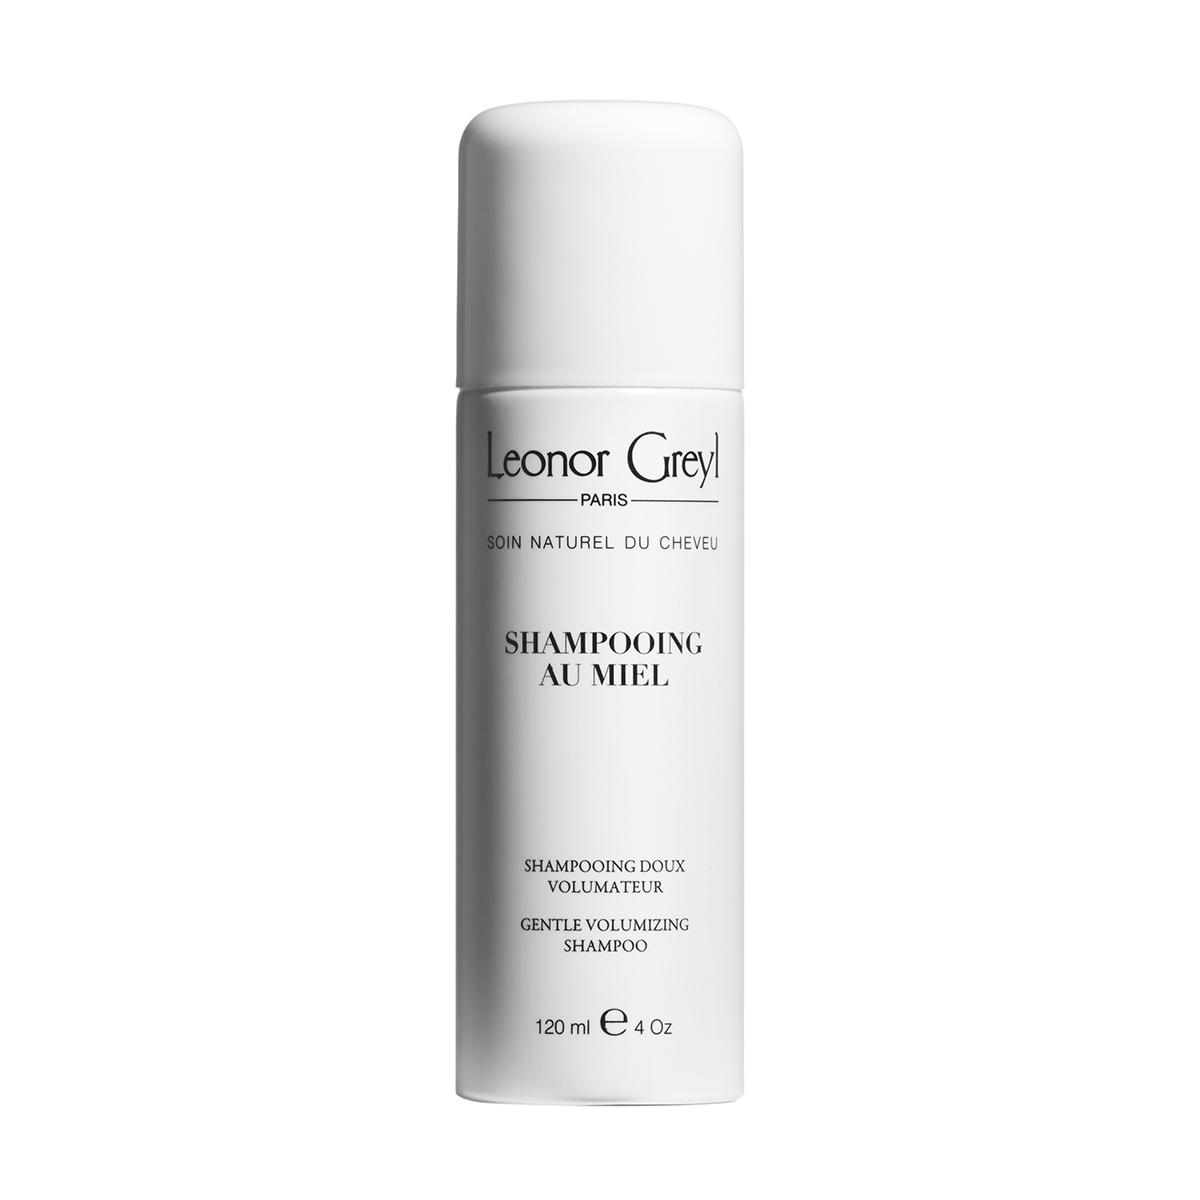 Shampooing au Miel | Leonor Greyl